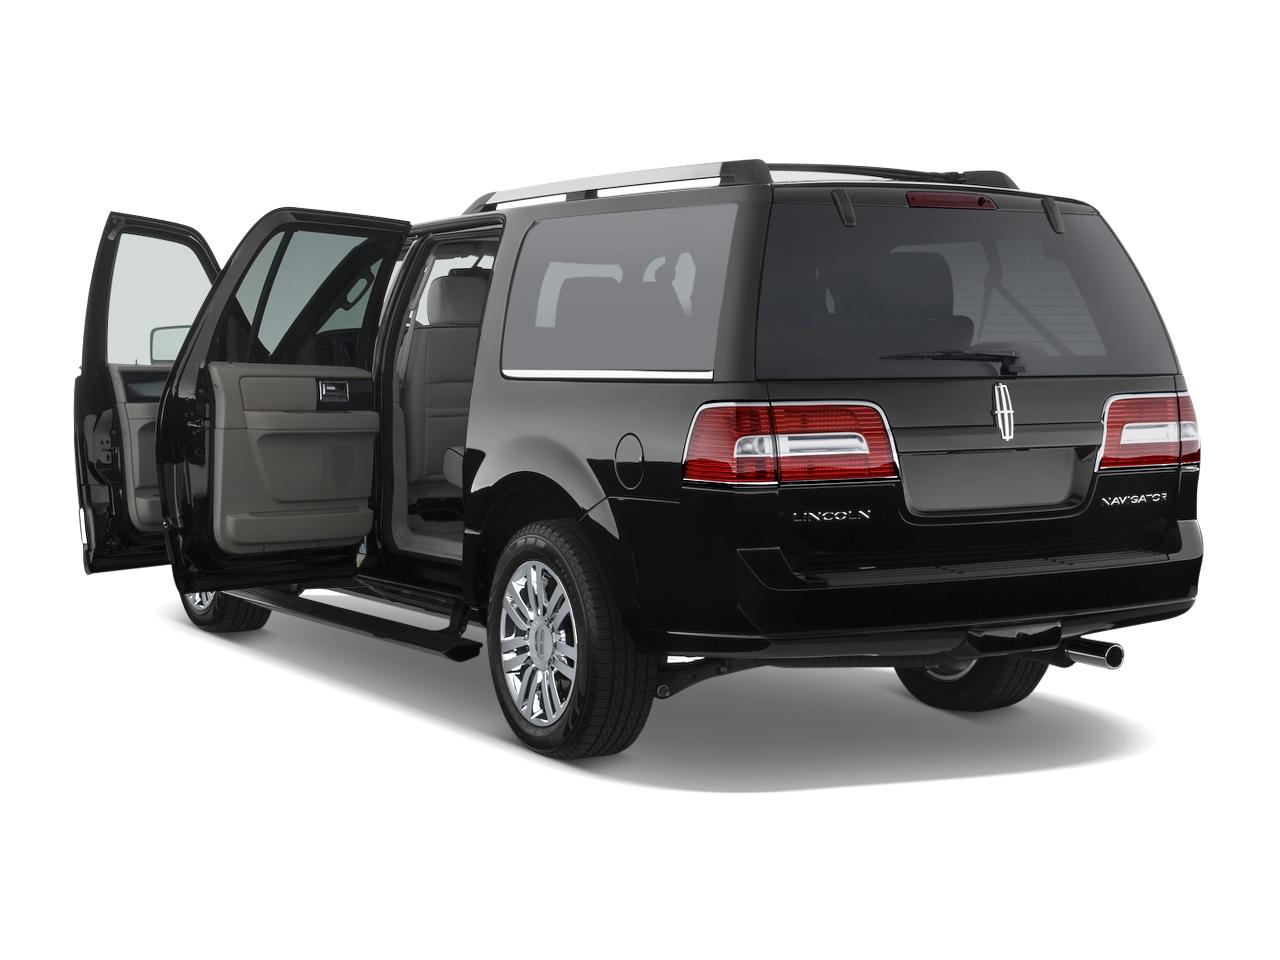 https://st.automobilemag.com/uploads/sites/10/2015/11/2007-lincoln-navigator-l-4wd-suv-doors.png